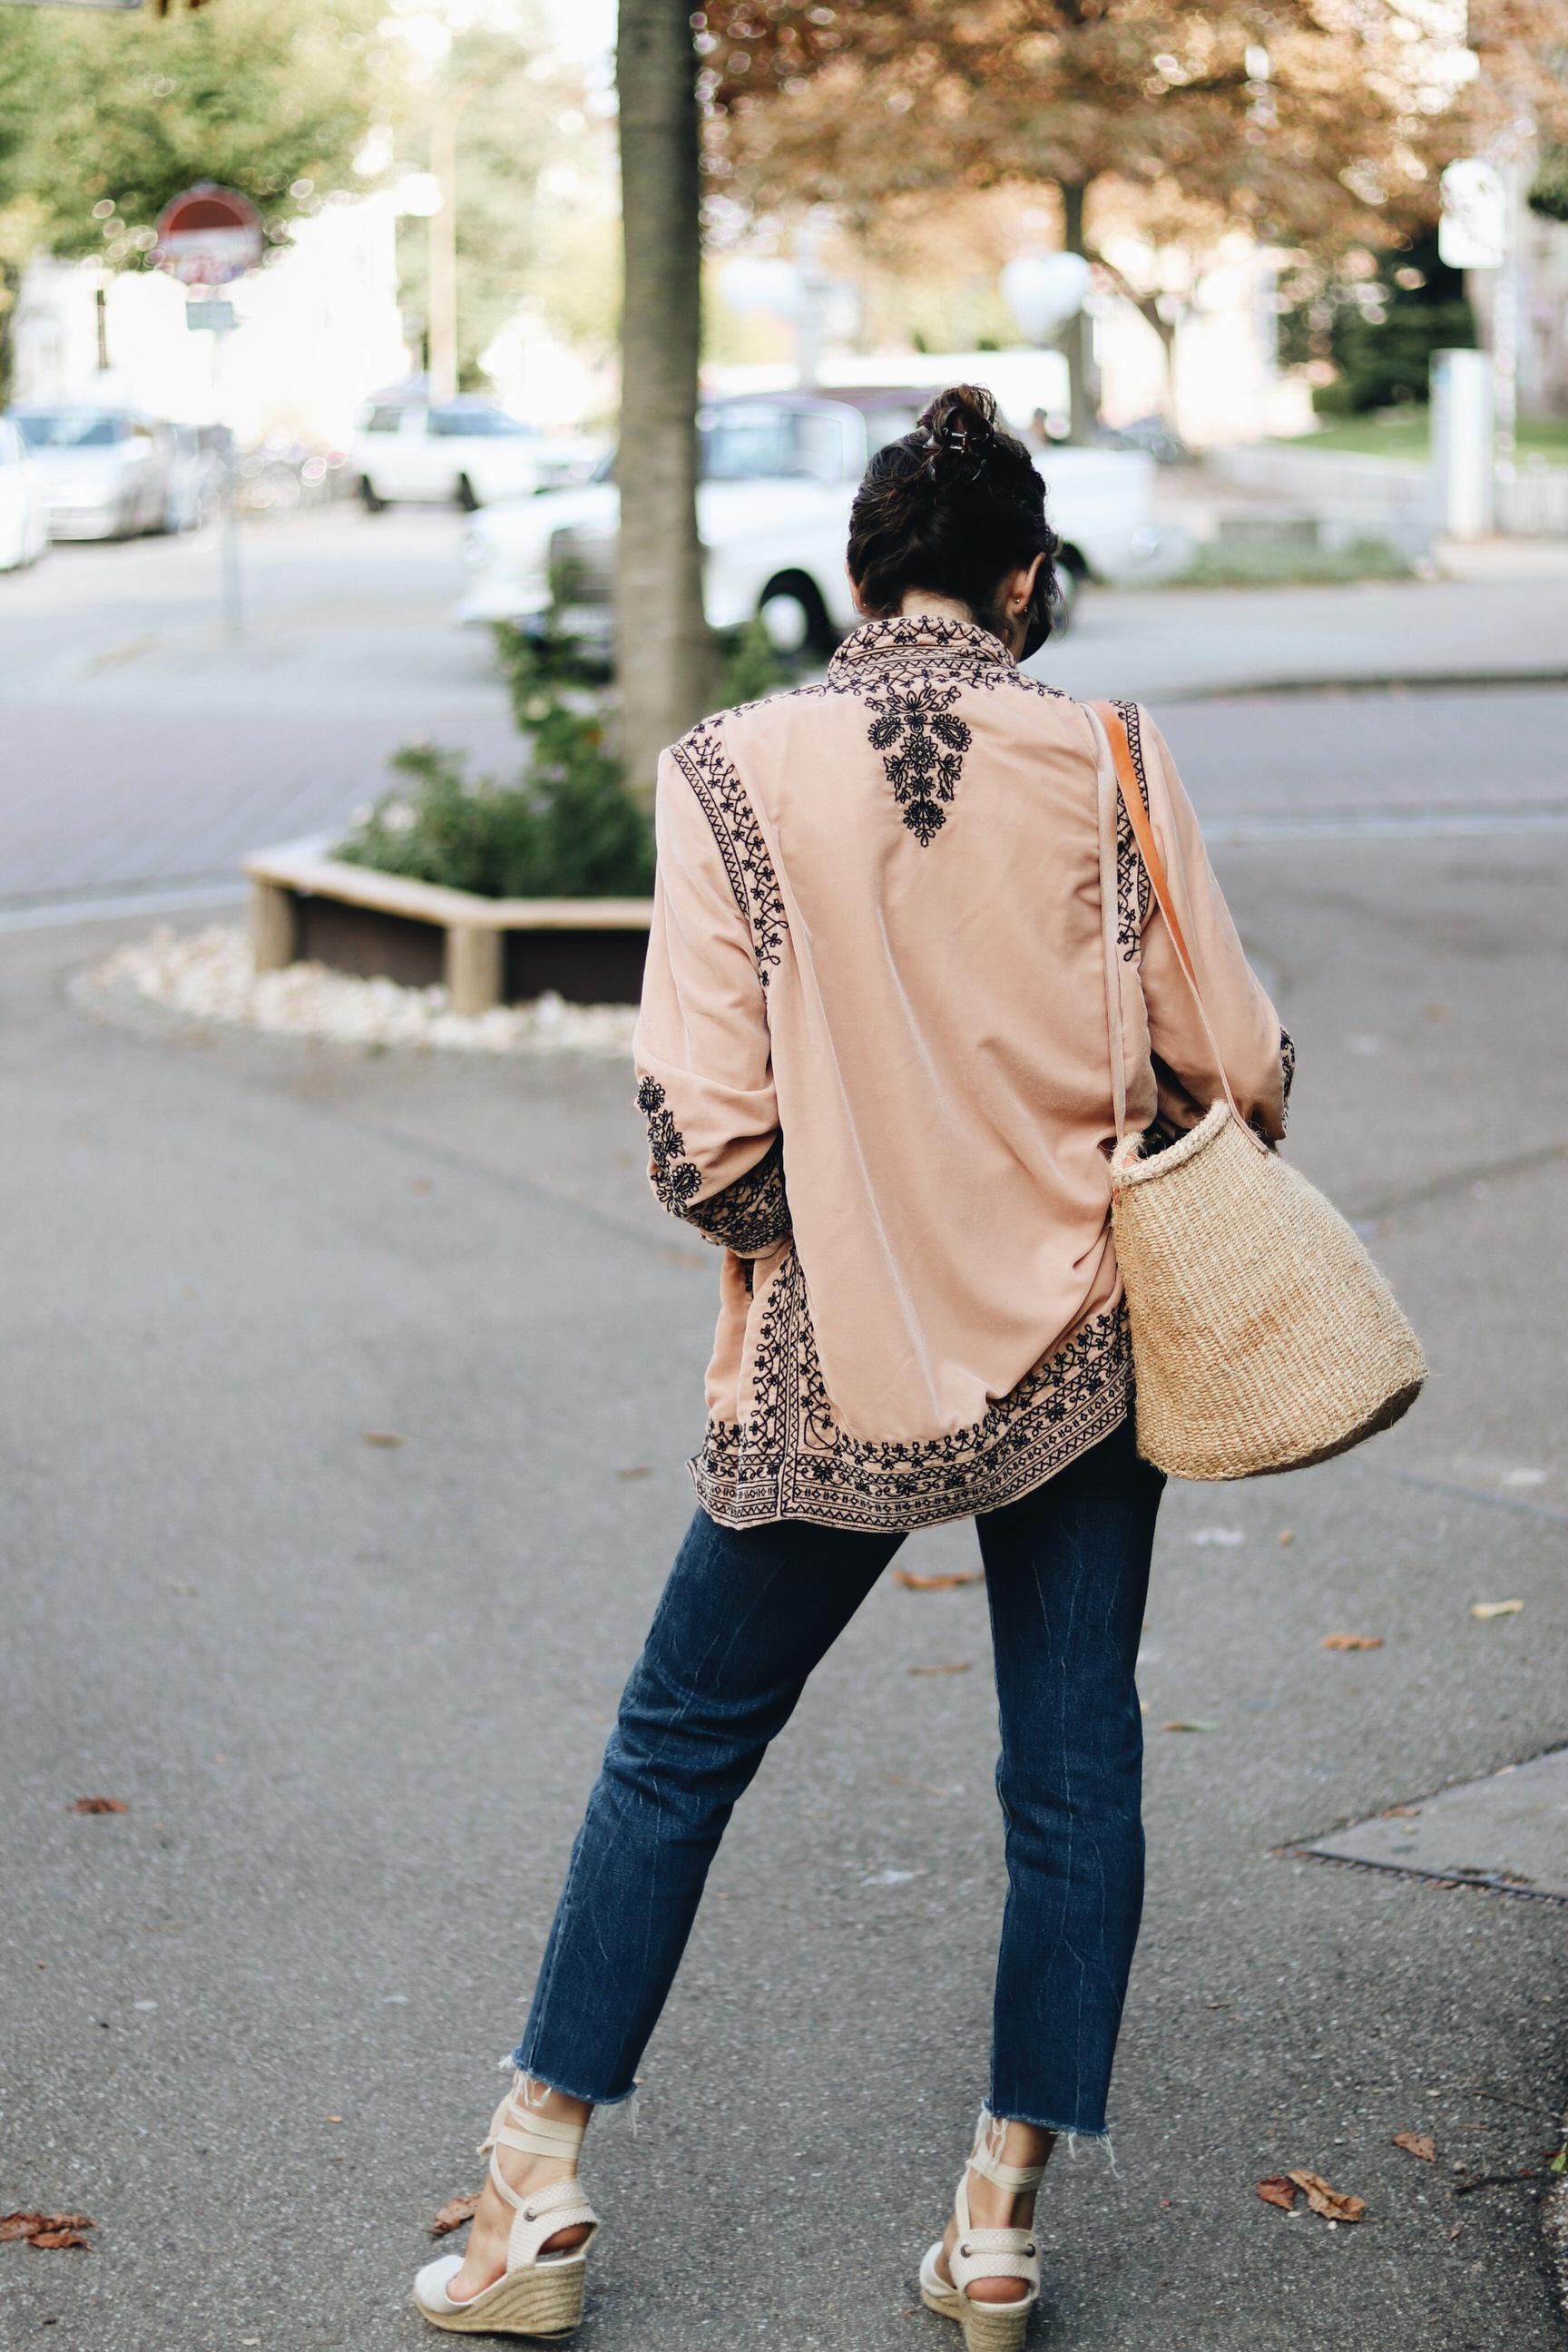 modeblog-outfit-ootd-modebloggern-deutschland-neele